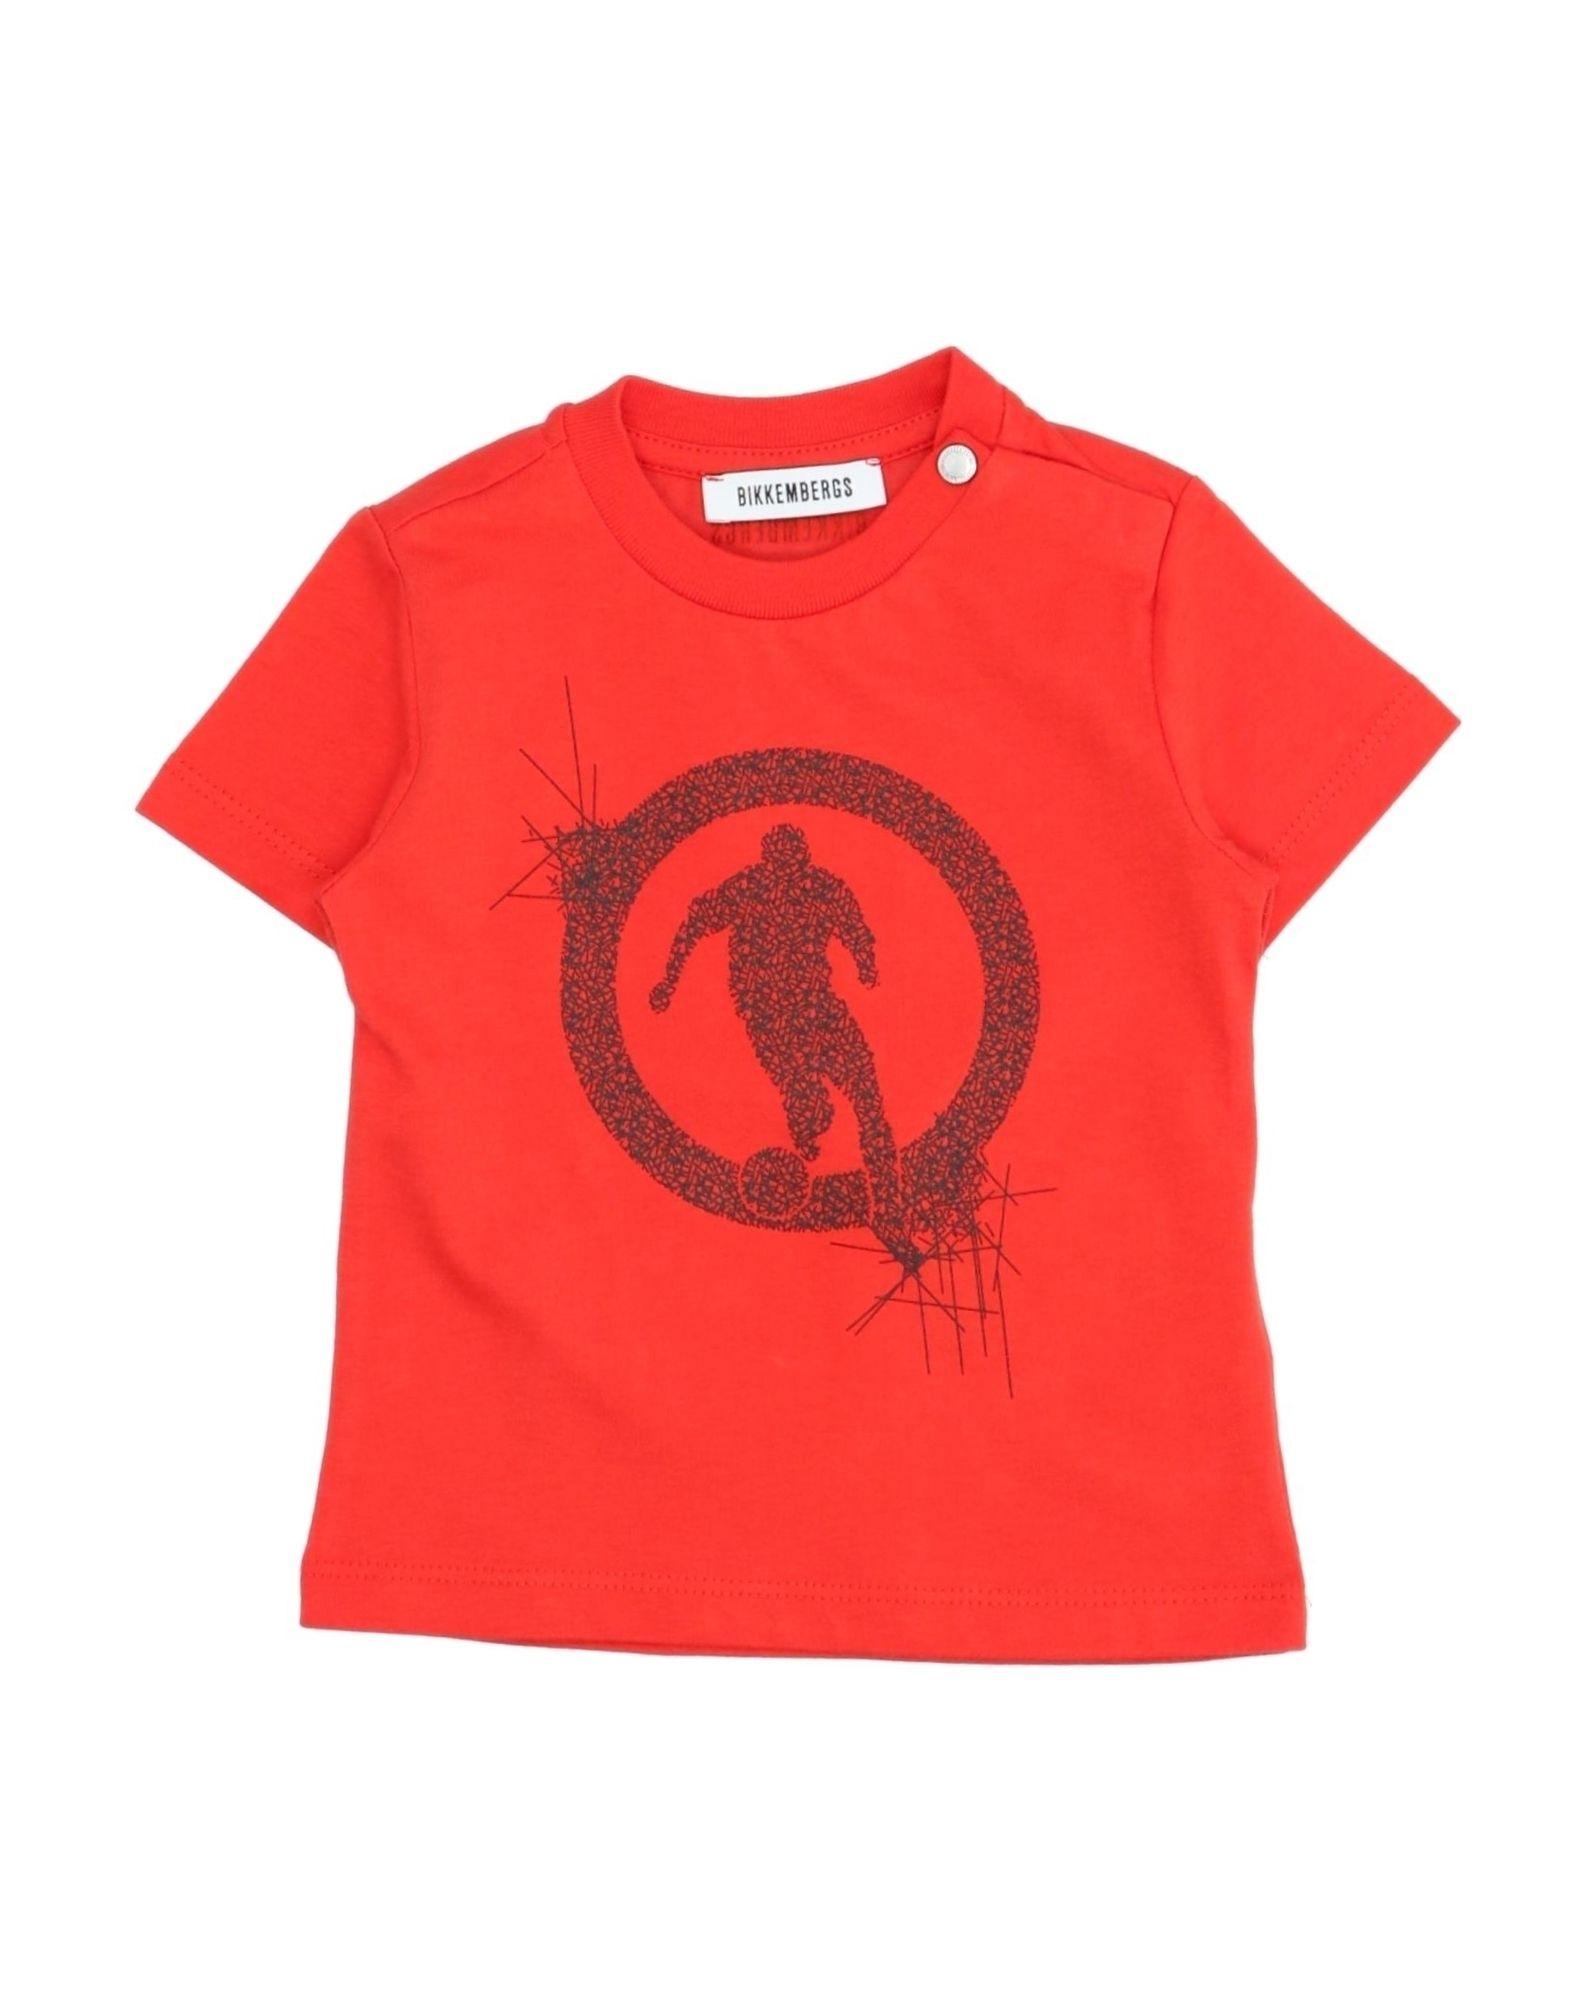 Bikkembergs Kids' T-shirts In Red